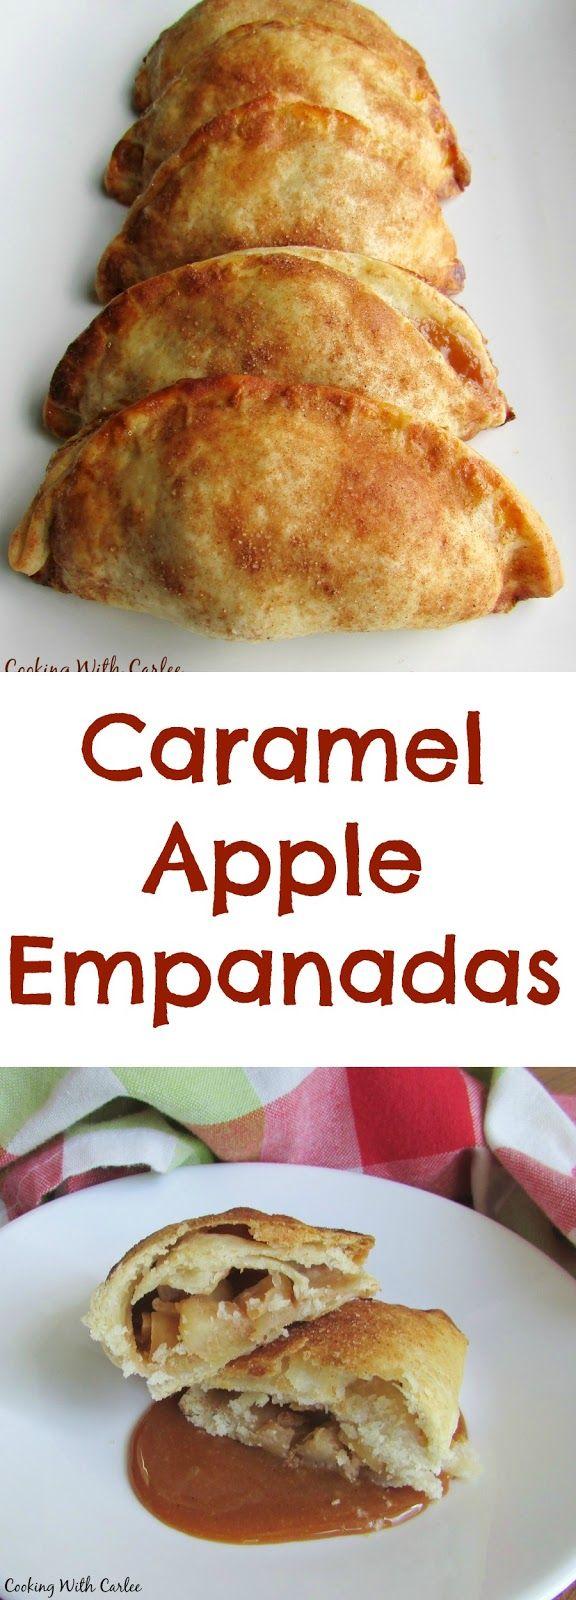 23 apple recipes vegan ideas